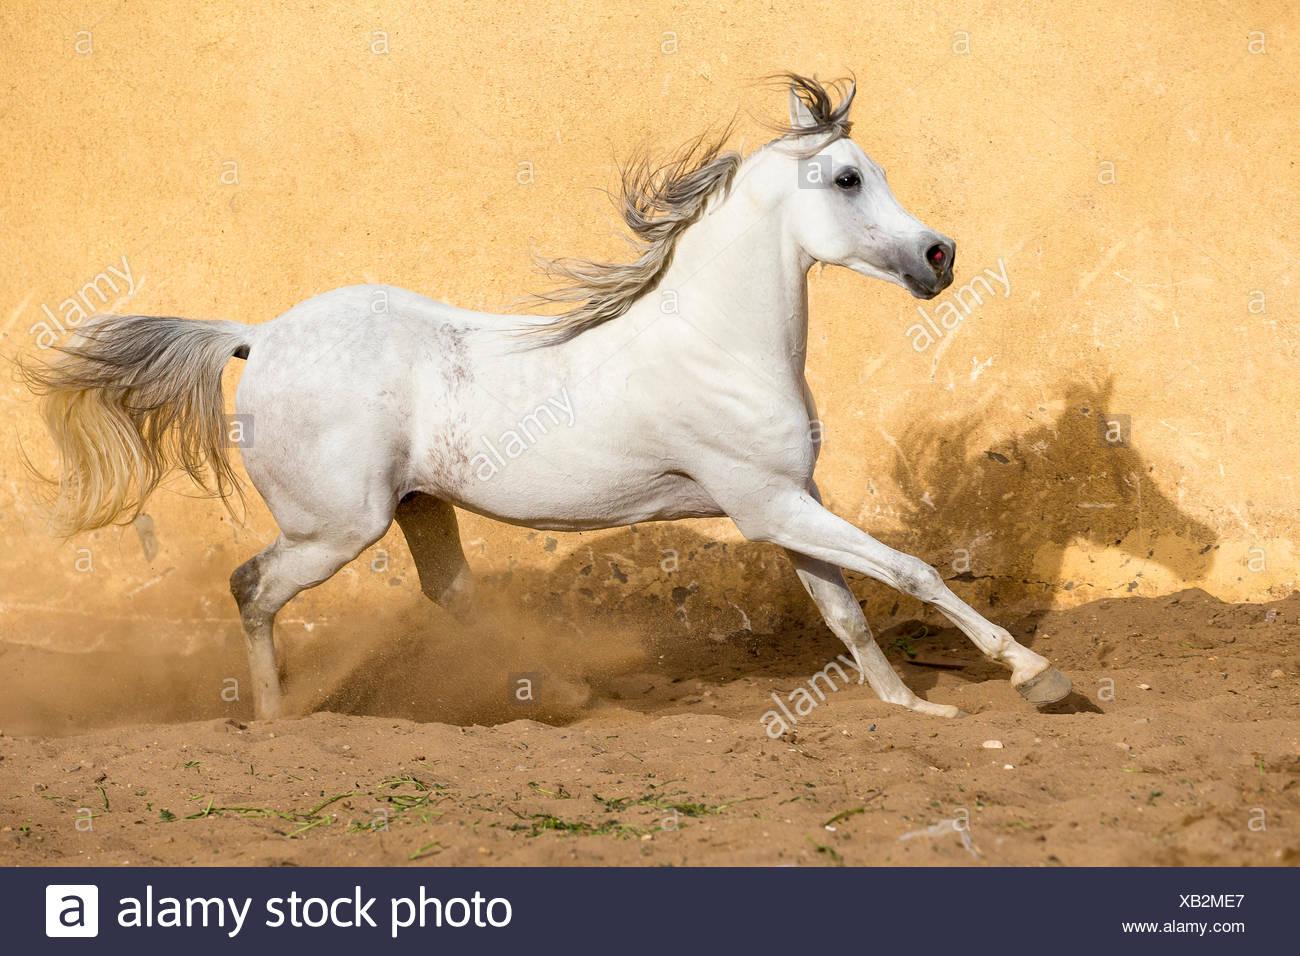 Arabian Horse Gray Stallion Galloping In A Paddock Egypt Stock Photo Alamy